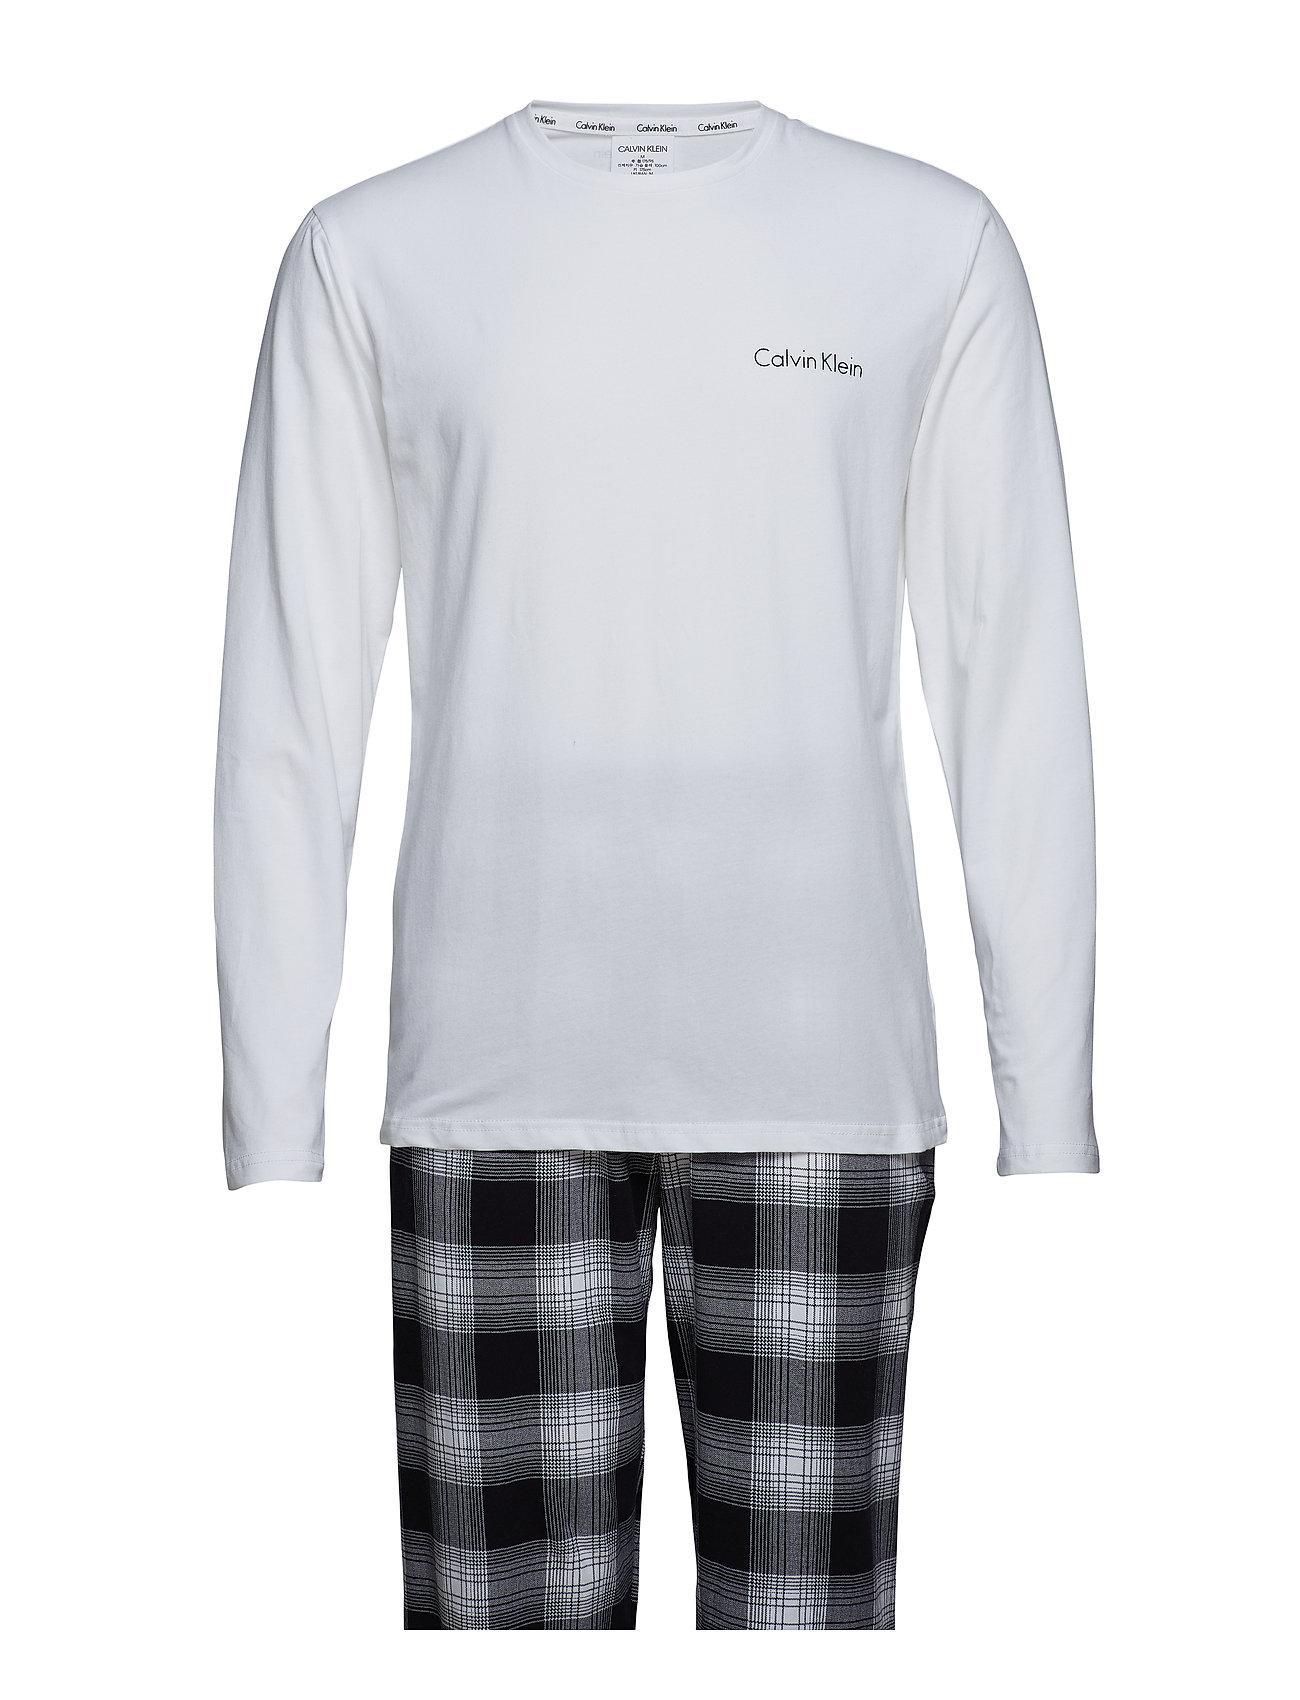 7141e1ebb3e WHITE TOP/SCHOOL PLAID BLACK Calvin Klein L/S Pant Set pyjamas for ...